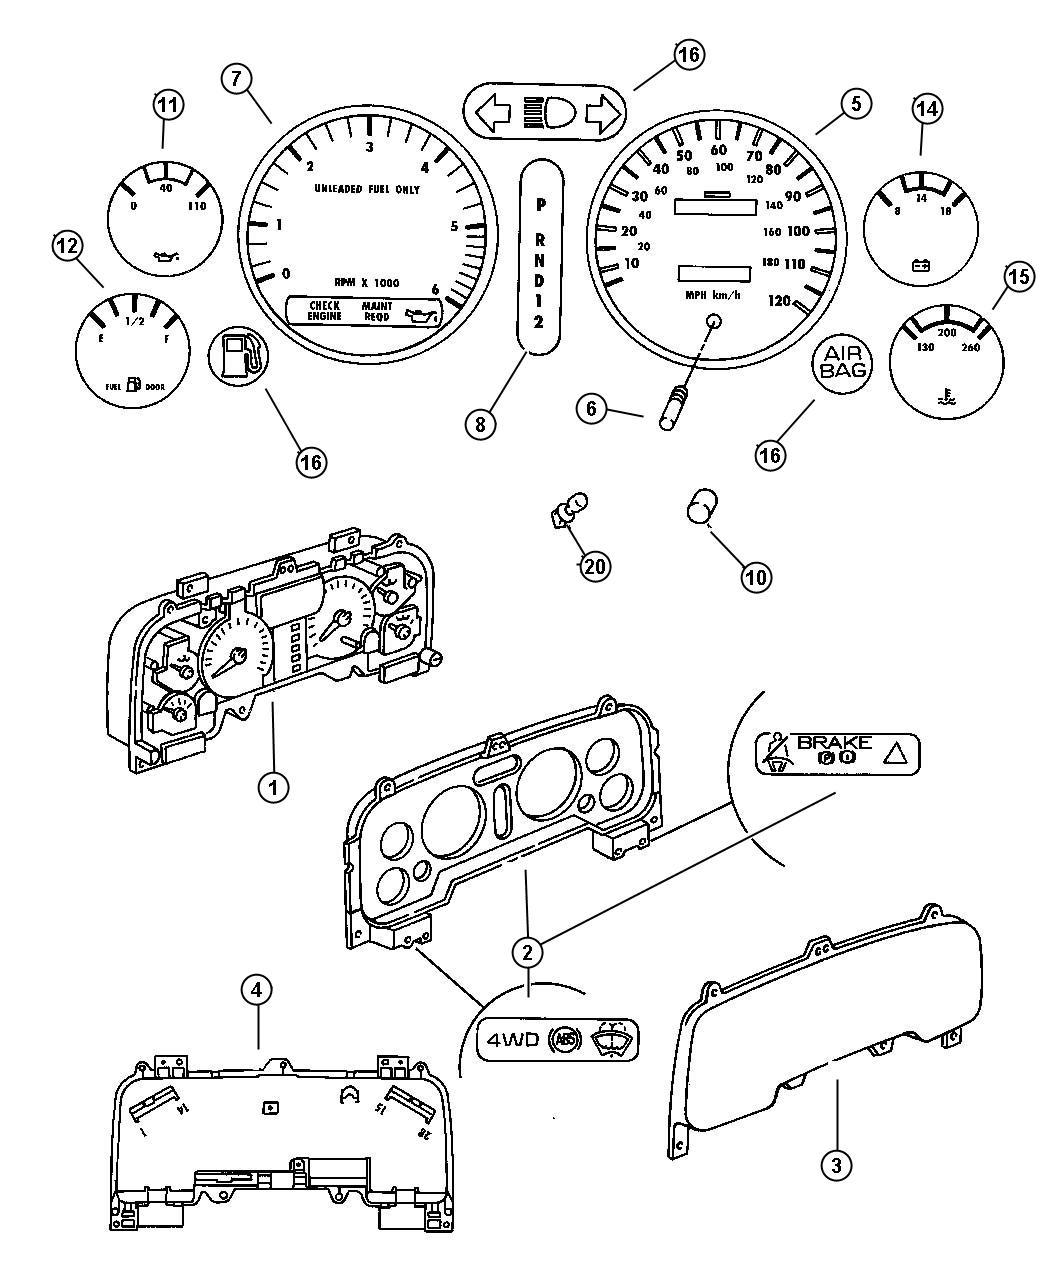 Dodge Ram Indicator Prndl Use Before 01 21 97 Or Aa After 01 20